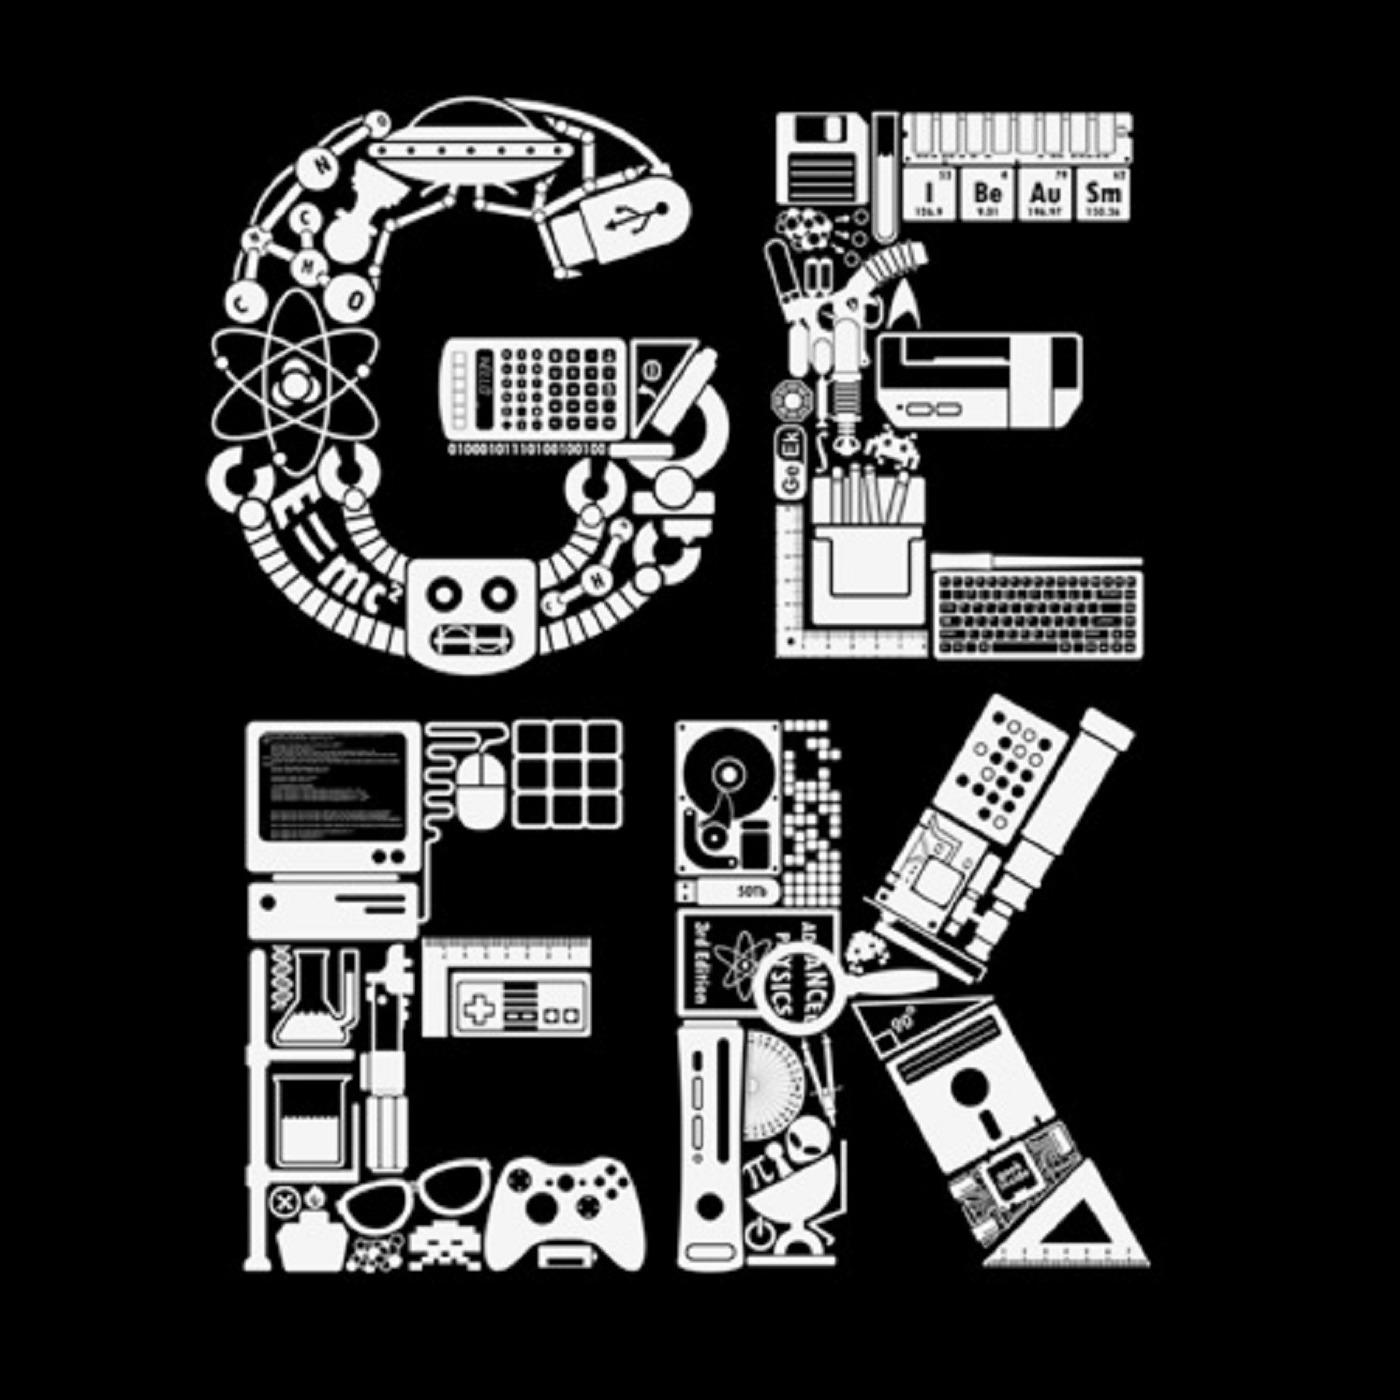 Geek-isms